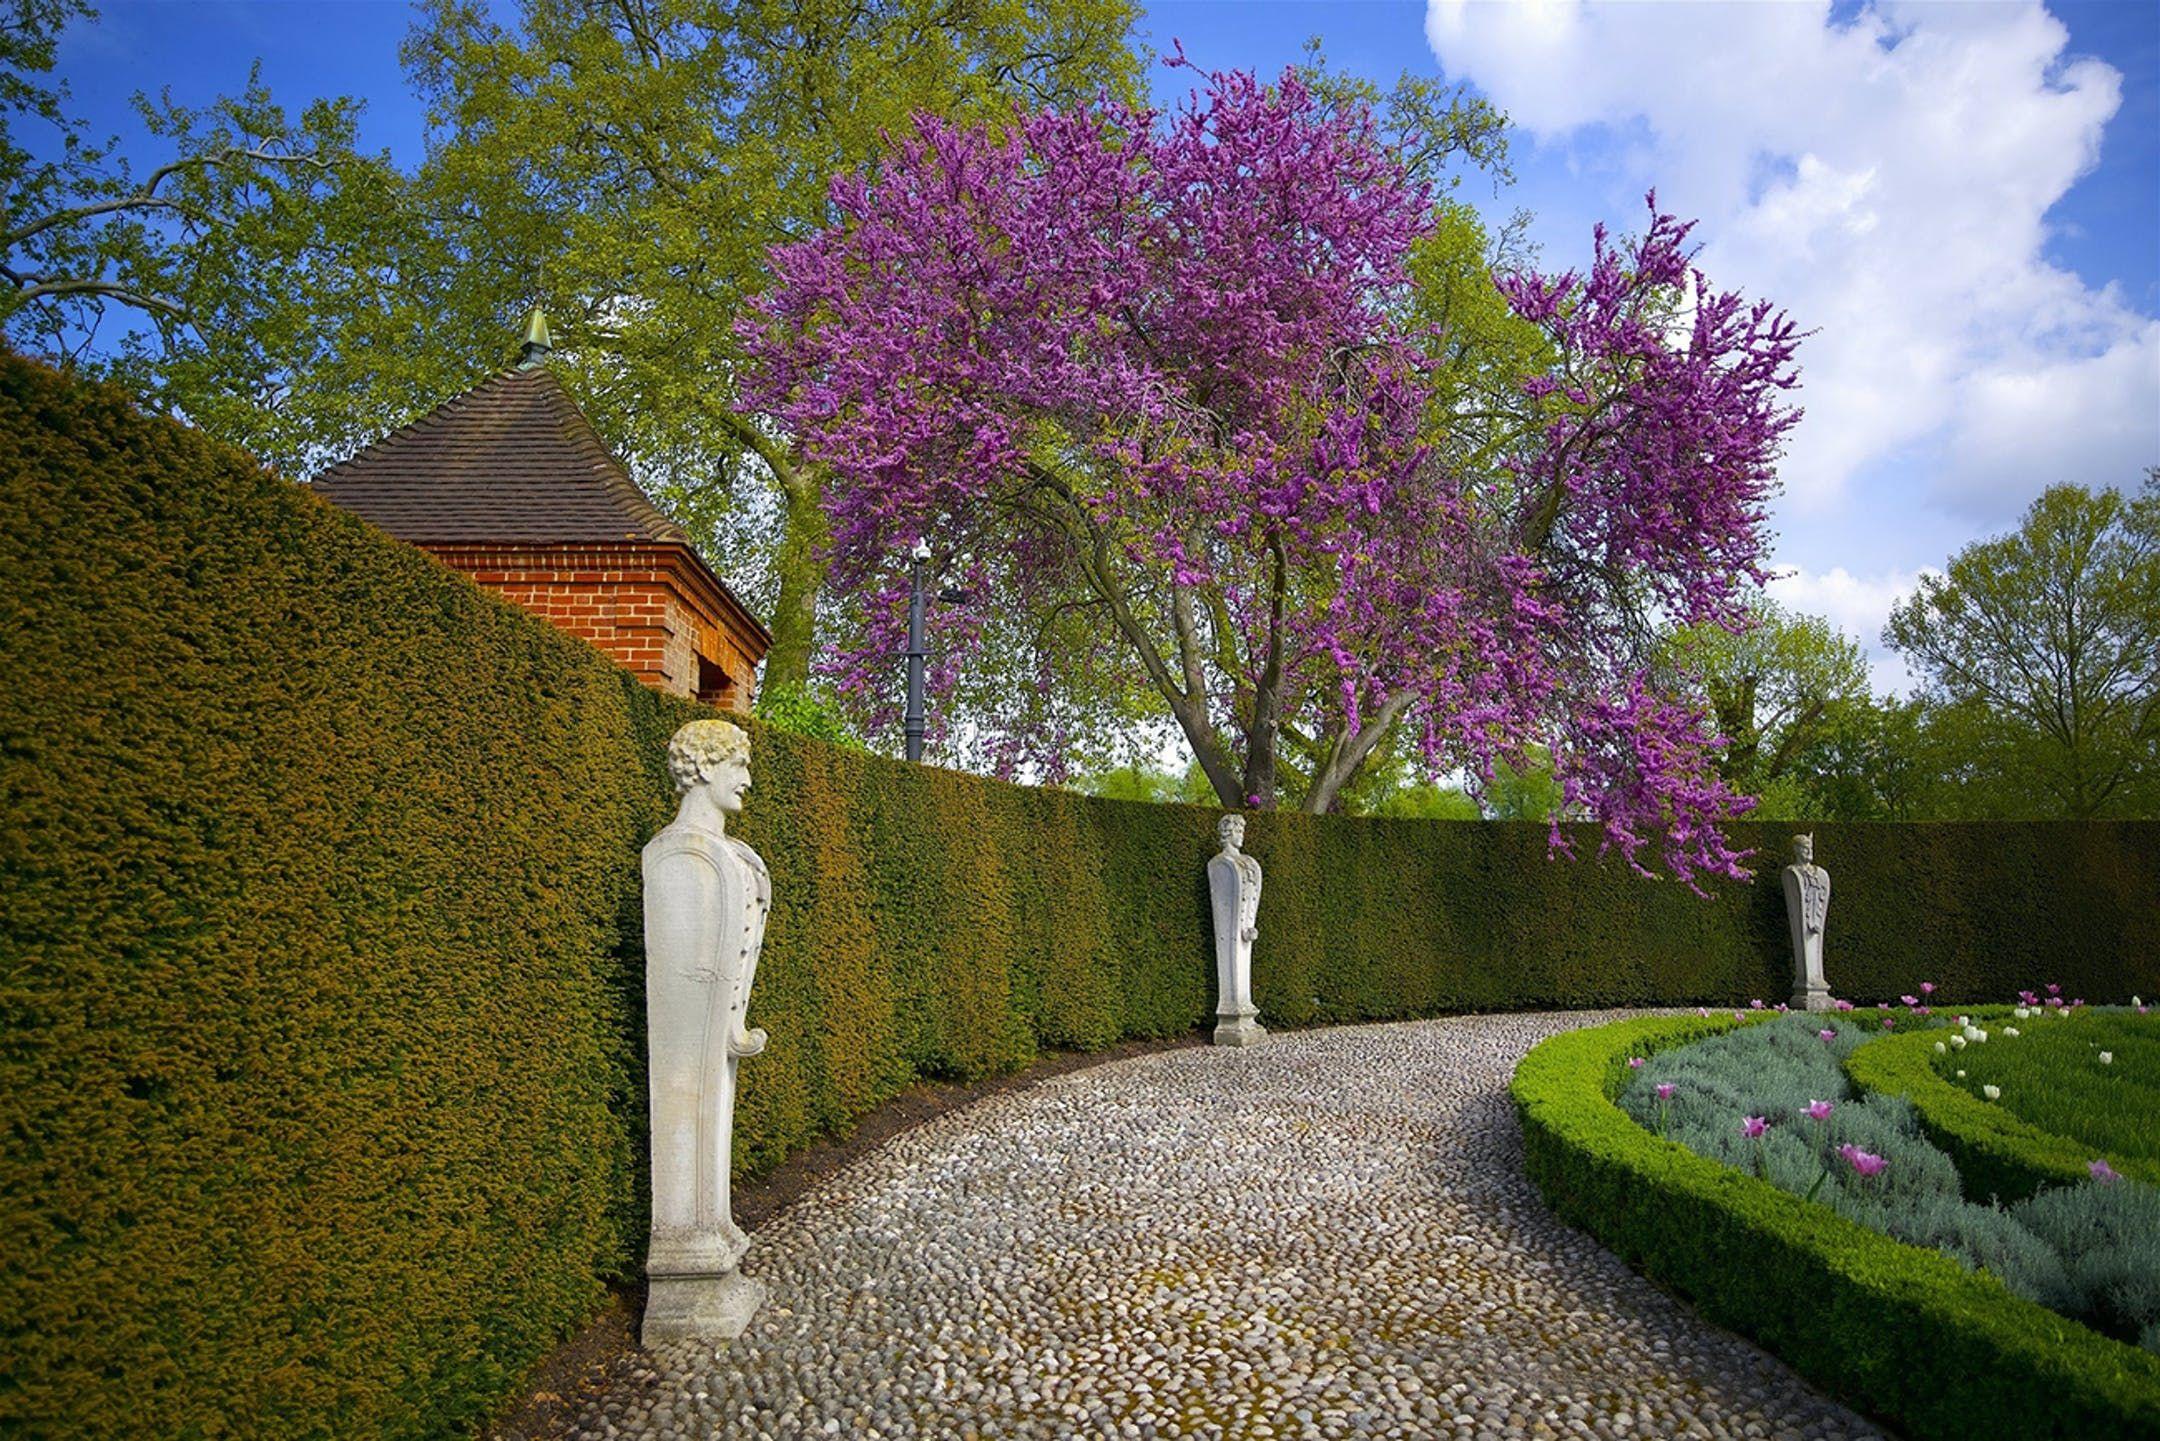 12a7d8f18db9d7fc0a52e91aaa8625ee - Best Places To Stay Near Kew Gardens